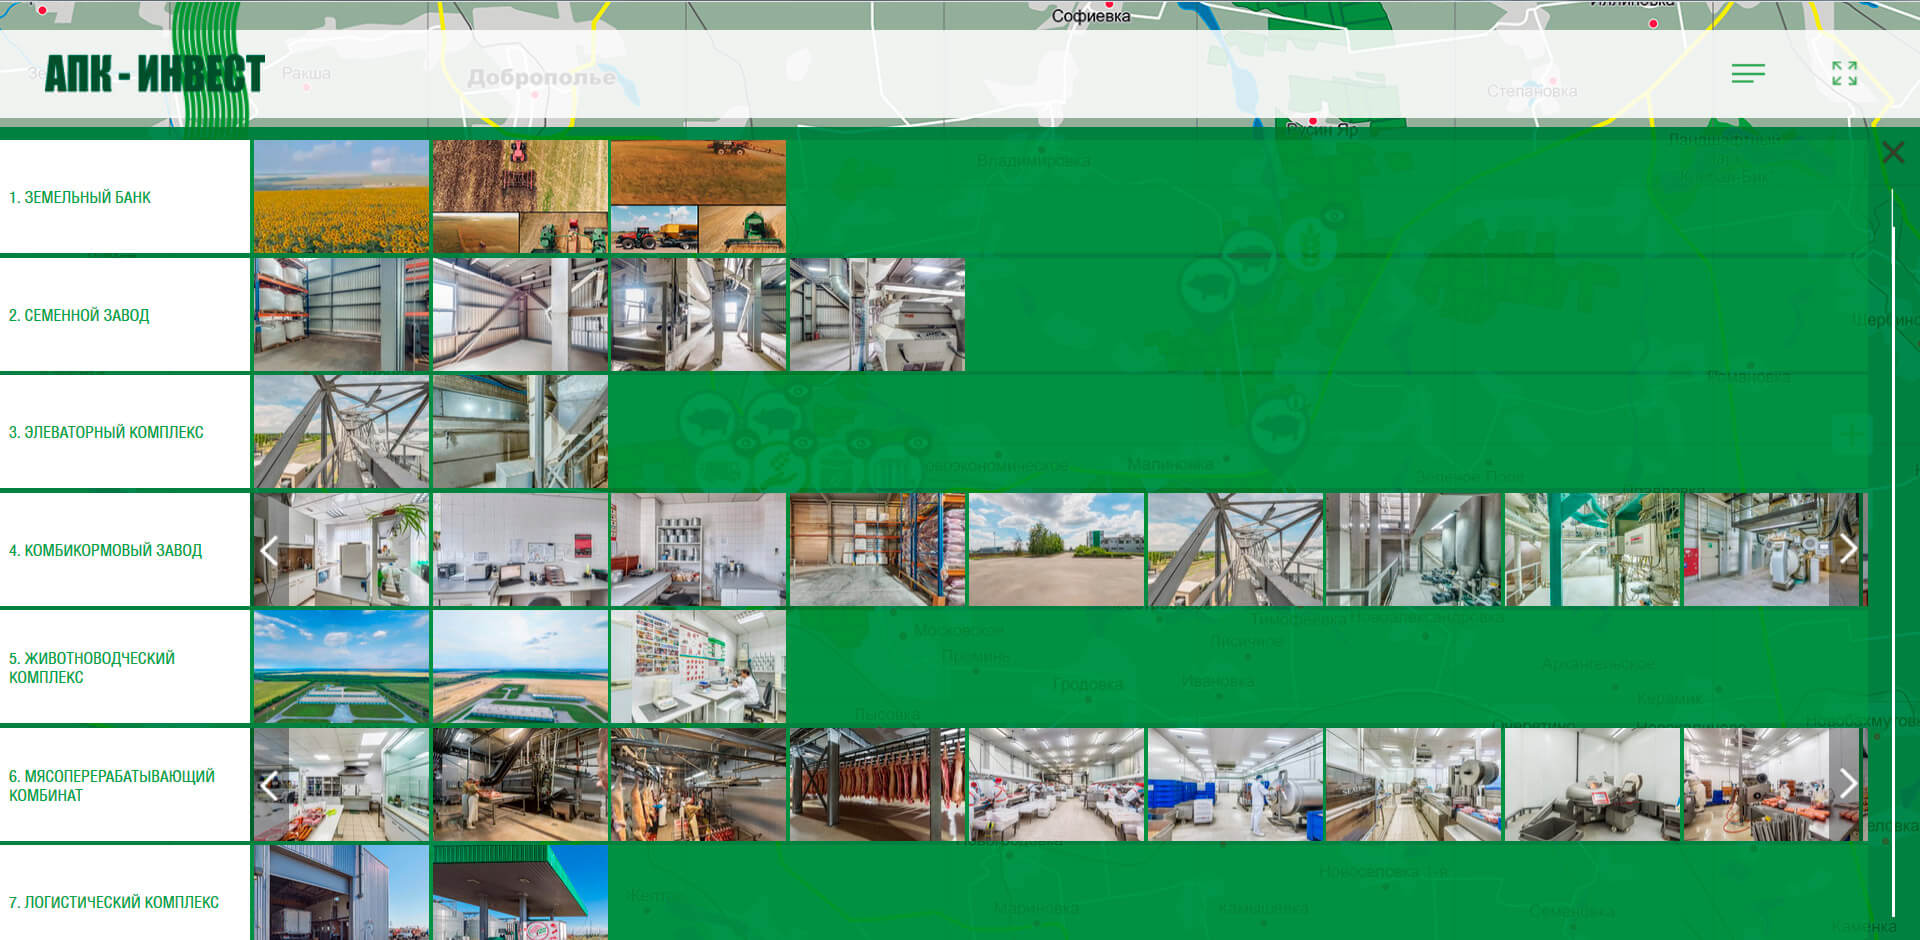 АПК-Инвест, виртуальный тур